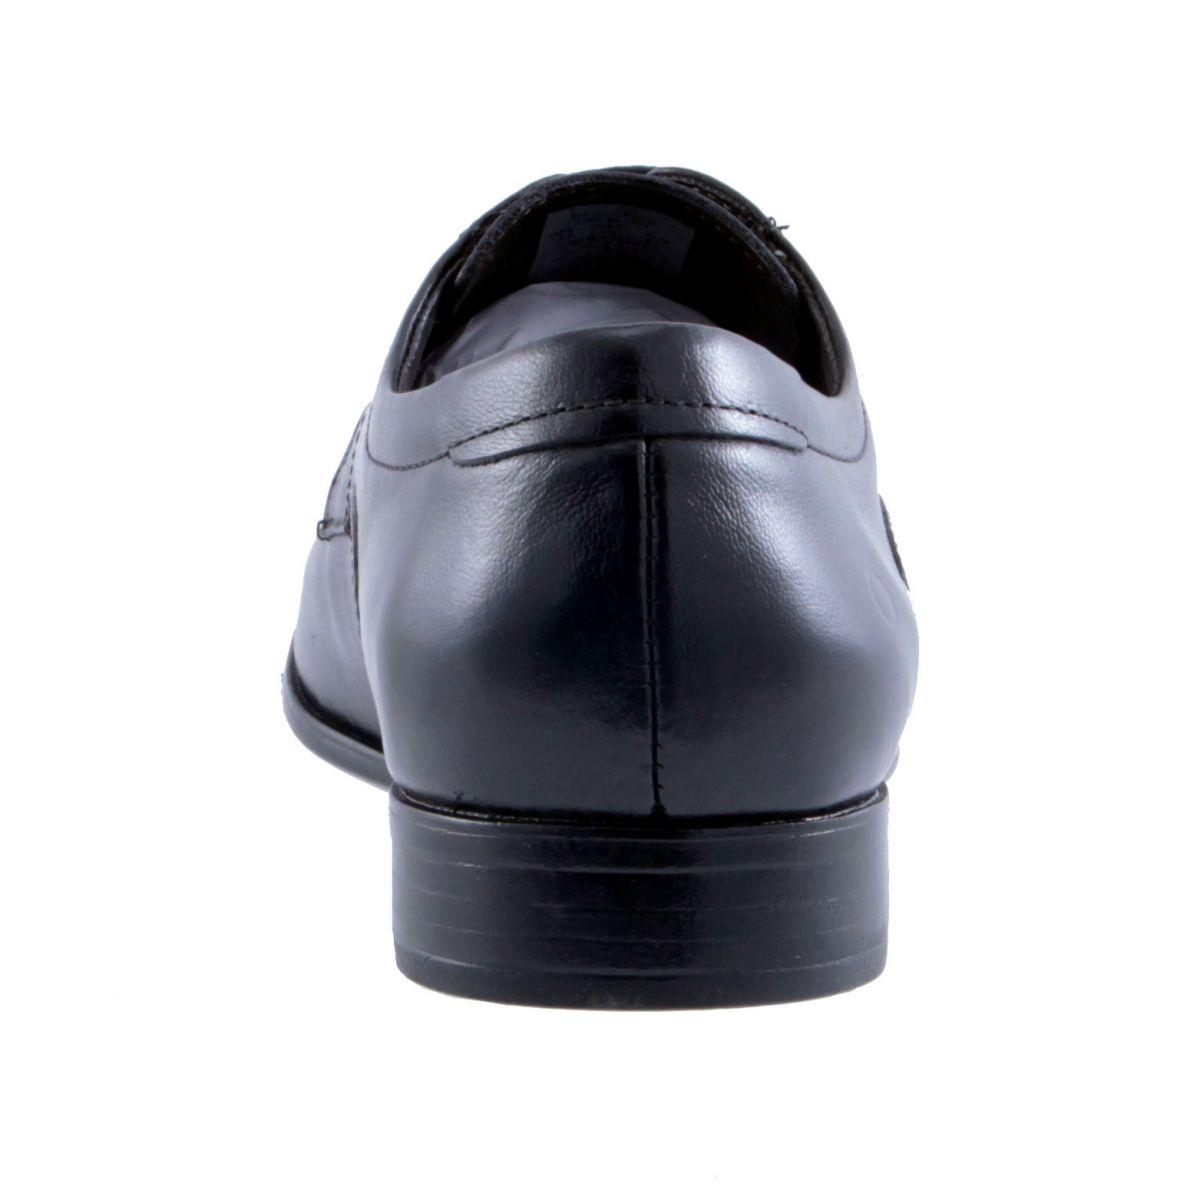 Sapato Social Democrata Premier Couro Legítimo 206285